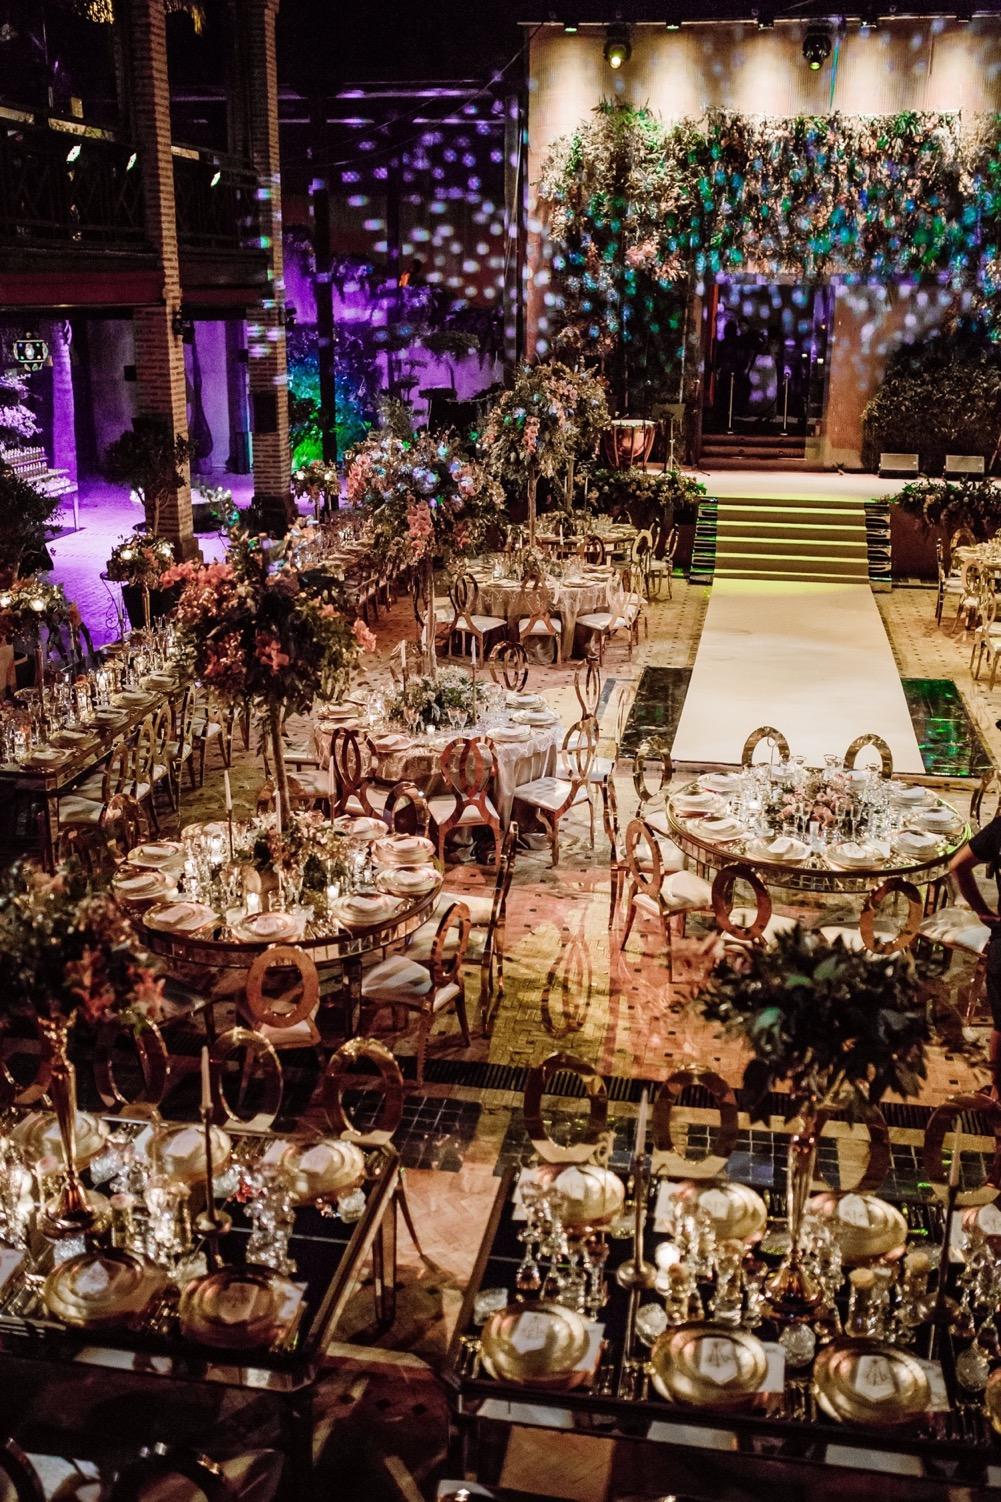 Si-Quiero-Wedding-Planner-By-Sira-Antequera-Bodas-Málaga-Marbella-Miami- L-A-22